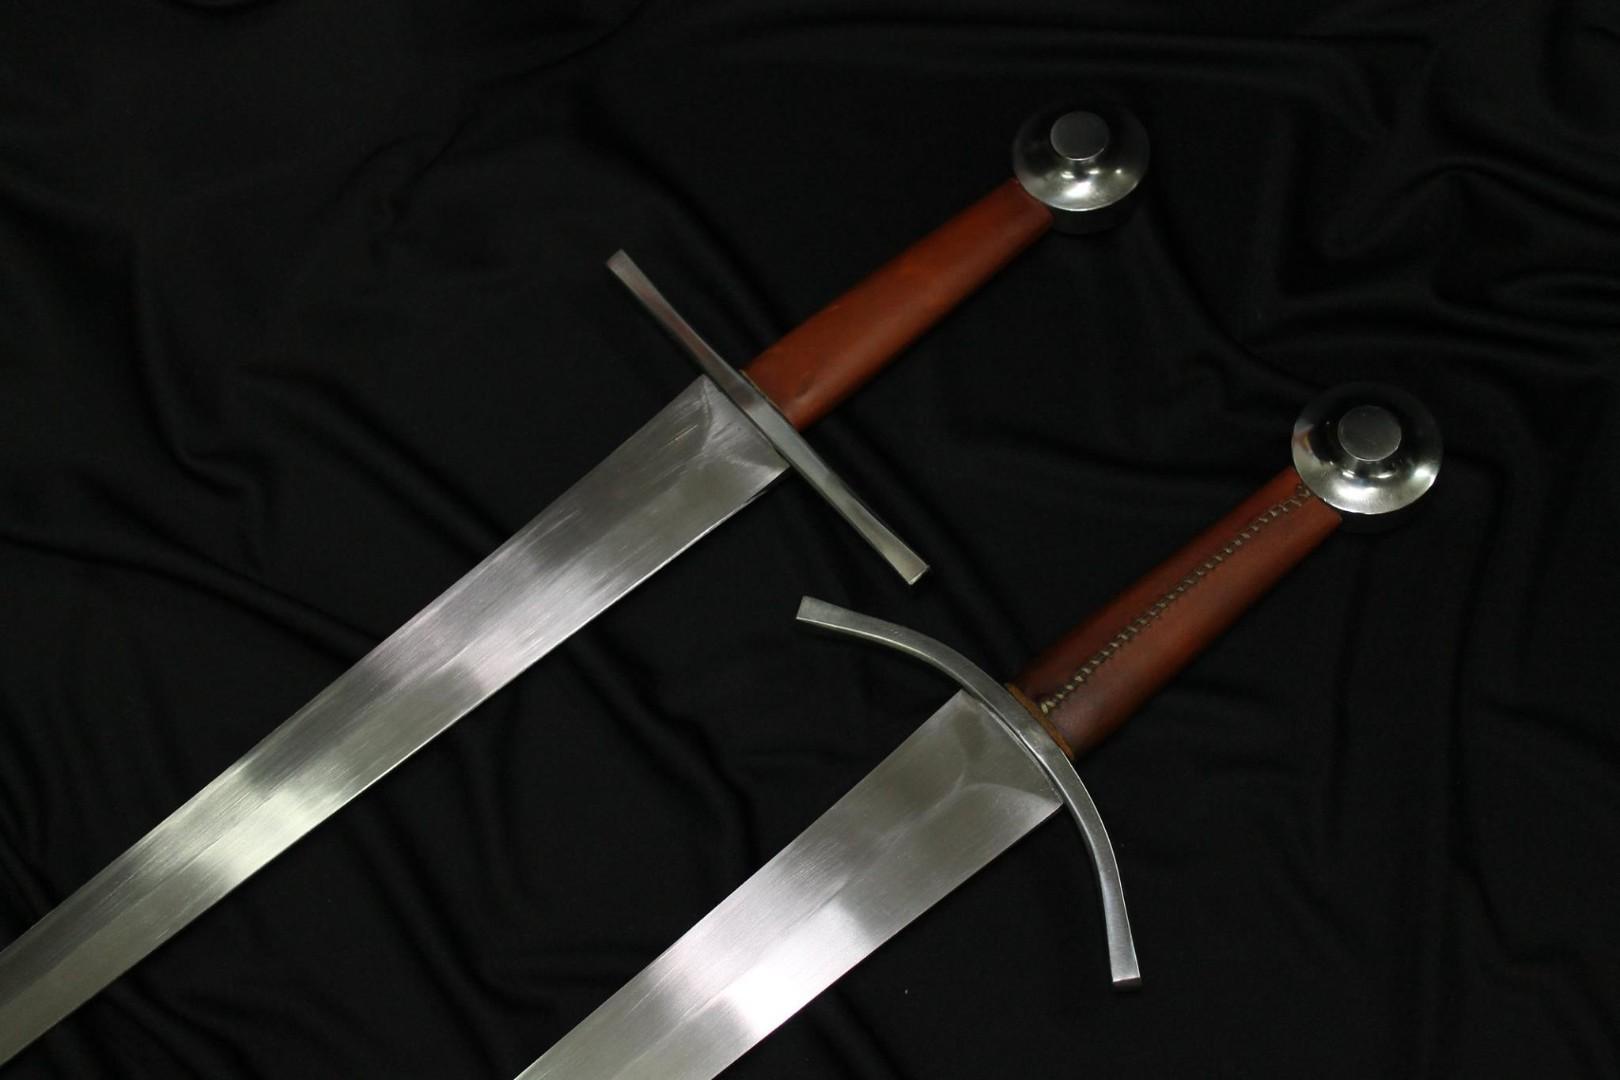 Arming sword, sword, hema, fencing, fiore, talhoffer